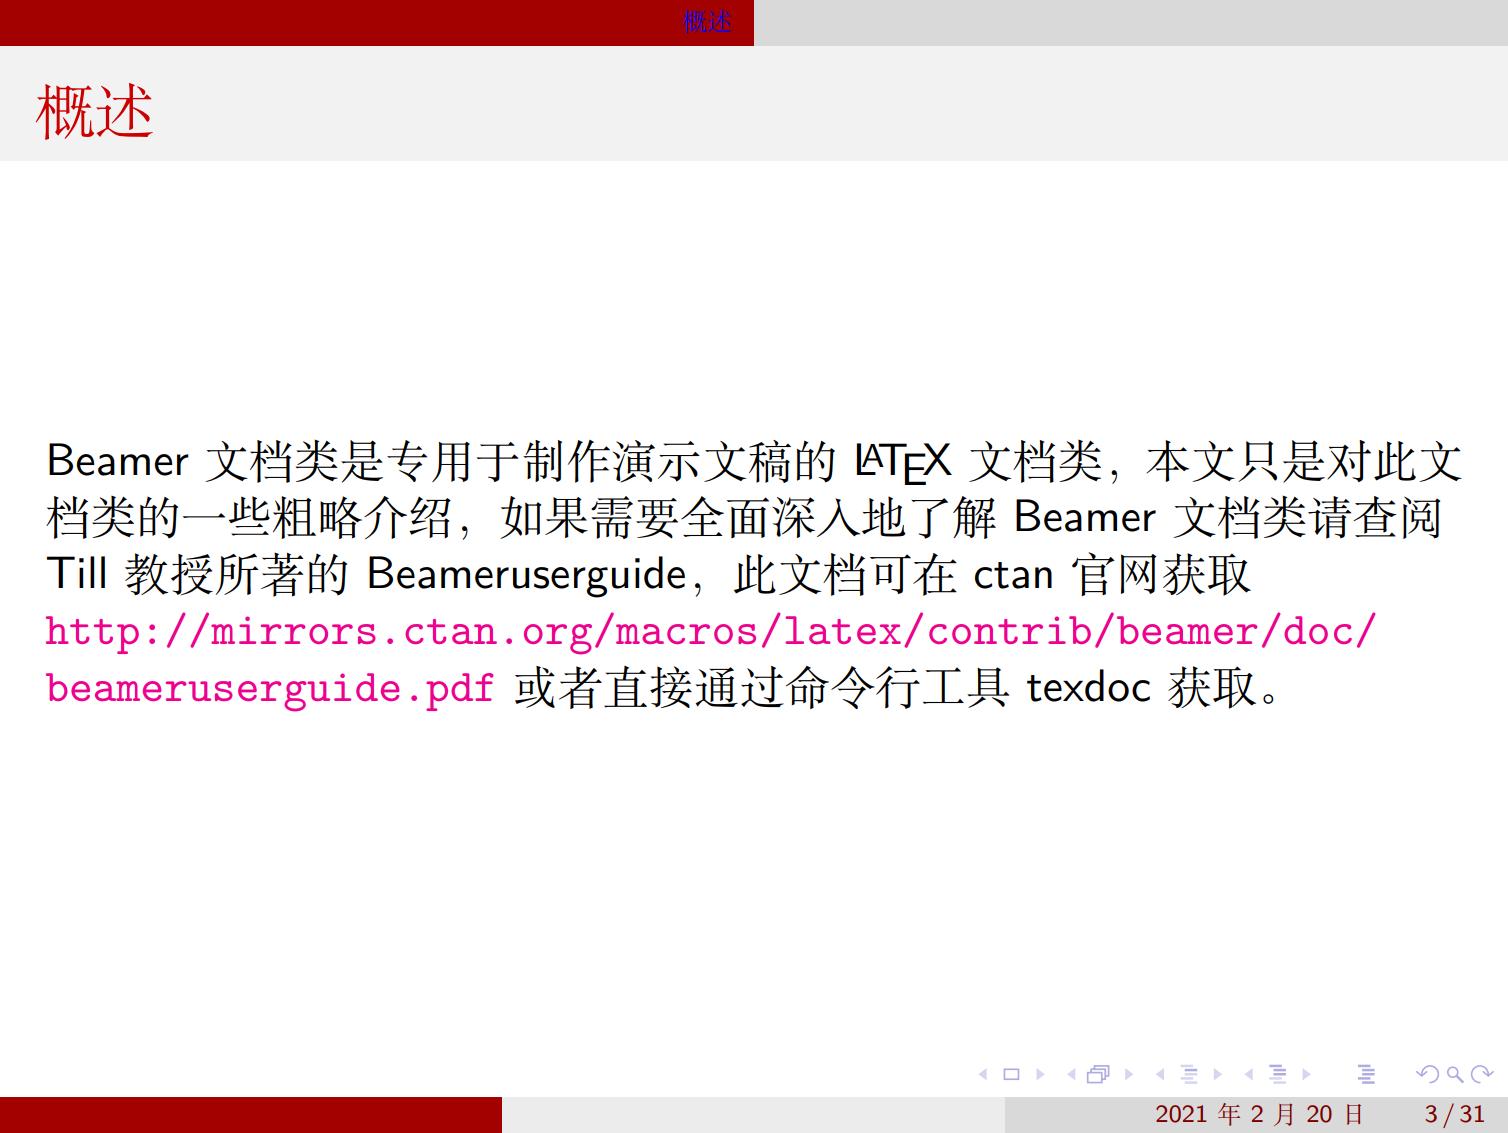 Beamer文档类的简单介绍